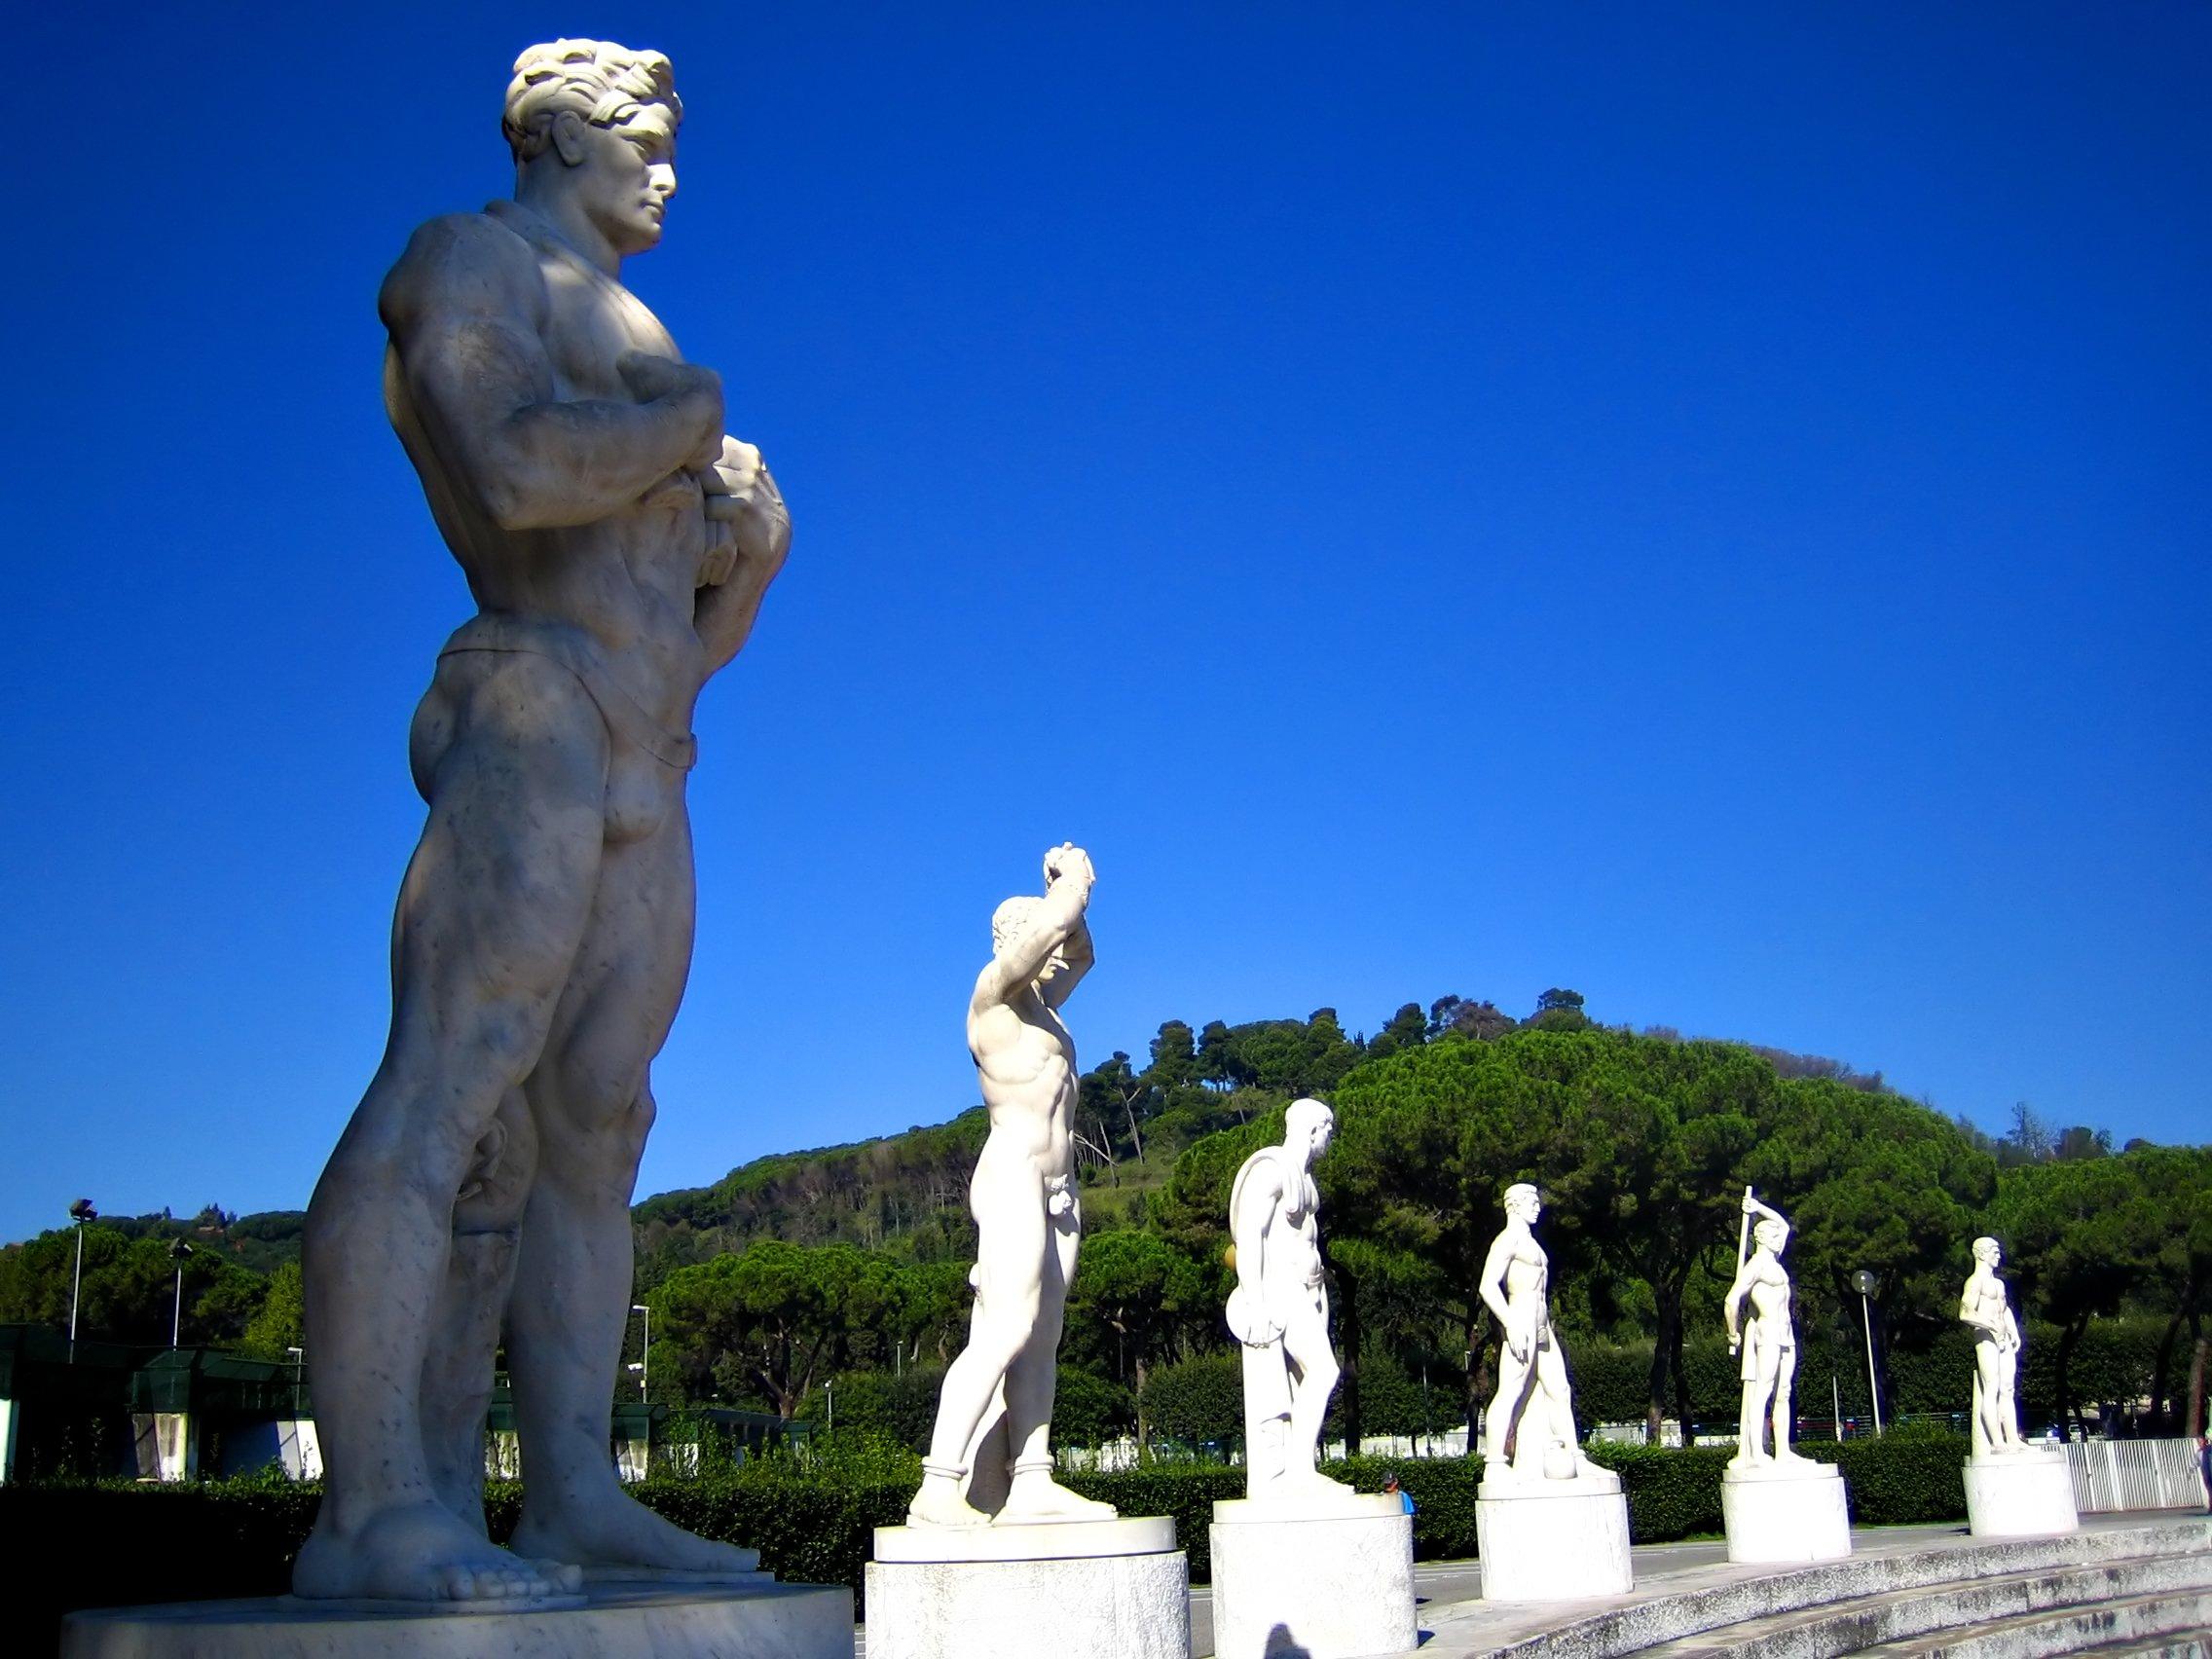 Where can I run in Rome?